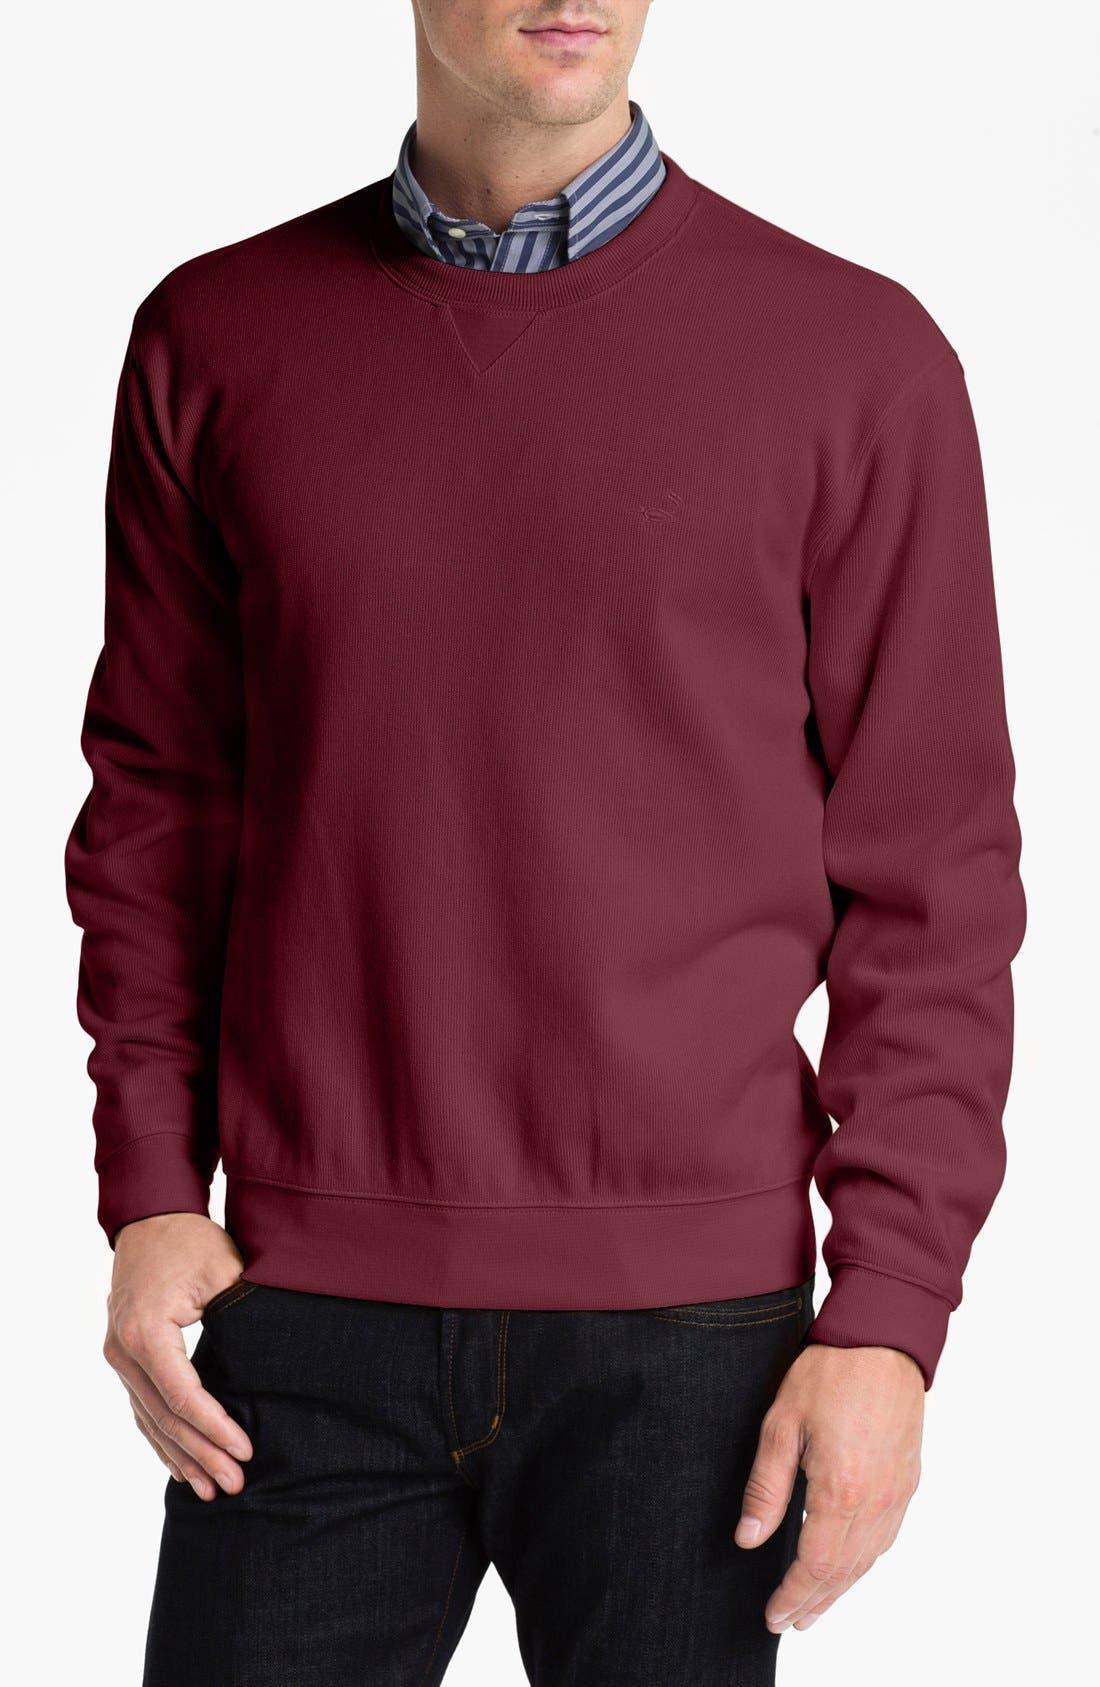 Alternate Image 1 Selected - Façonnable Crewneck Regular Fit Sweatshirt